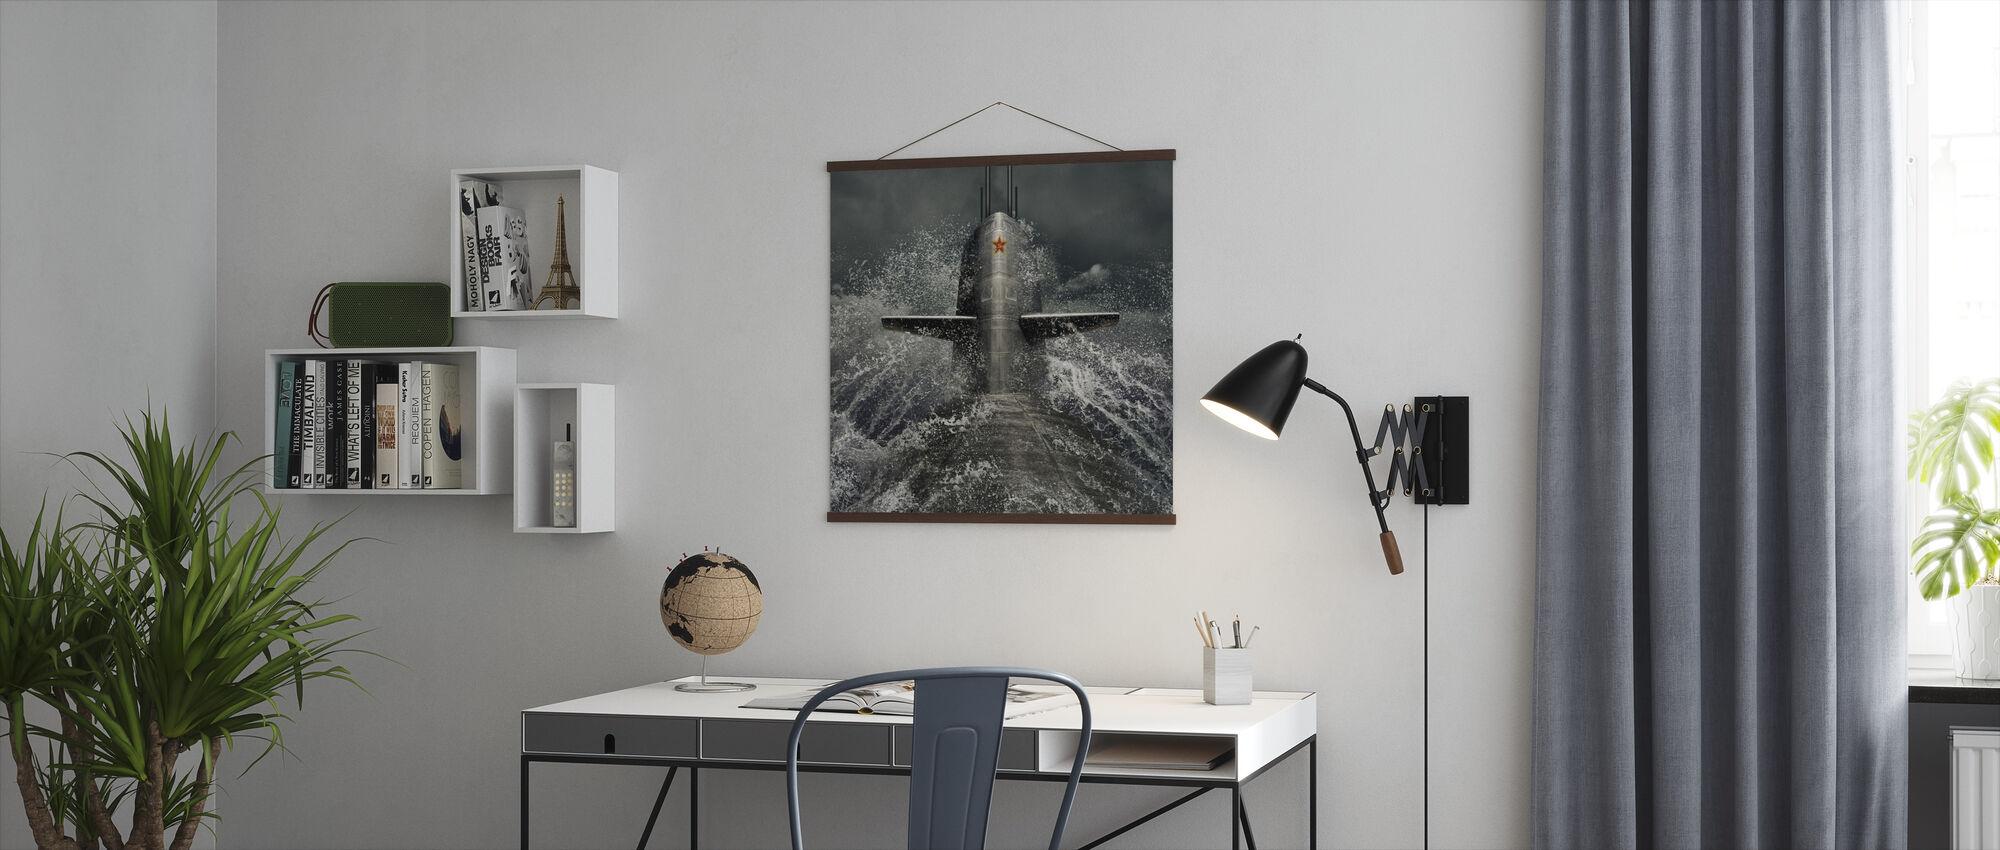 Ubåten - Plakat - Kontor